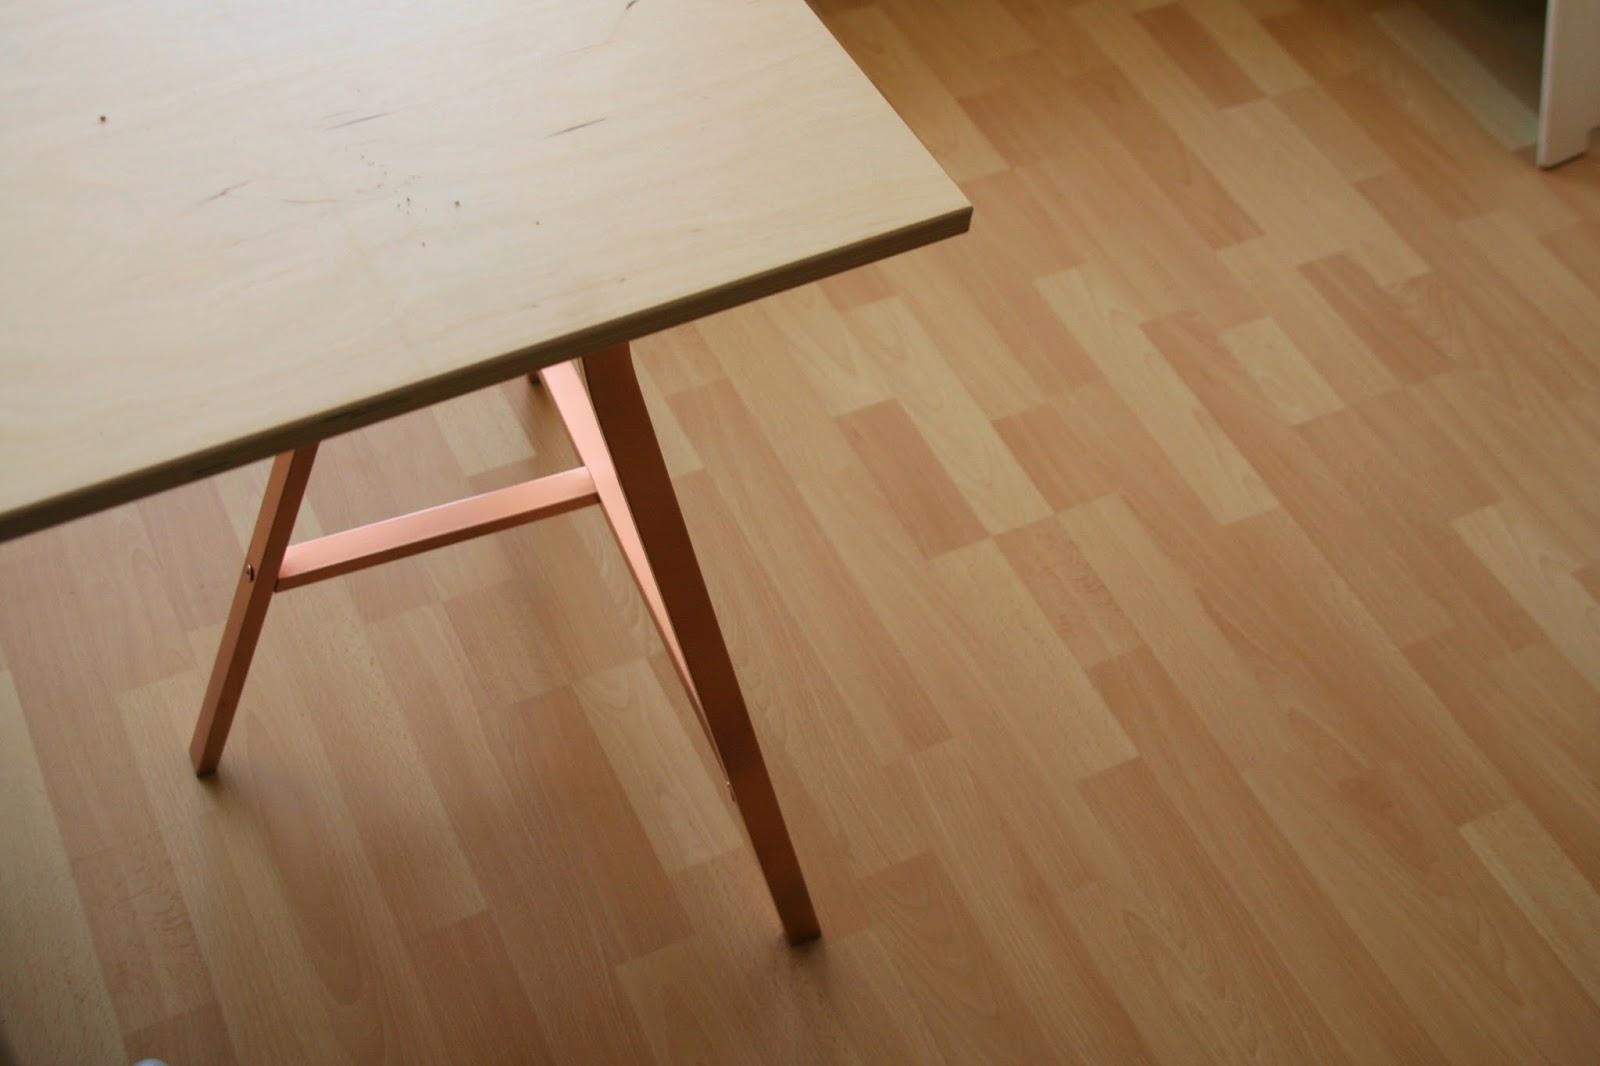 vida nullvier diy i schreibtischplatte easy aufgeh bscht. Black Bedroom Furniture Sets. Home Design Ideas